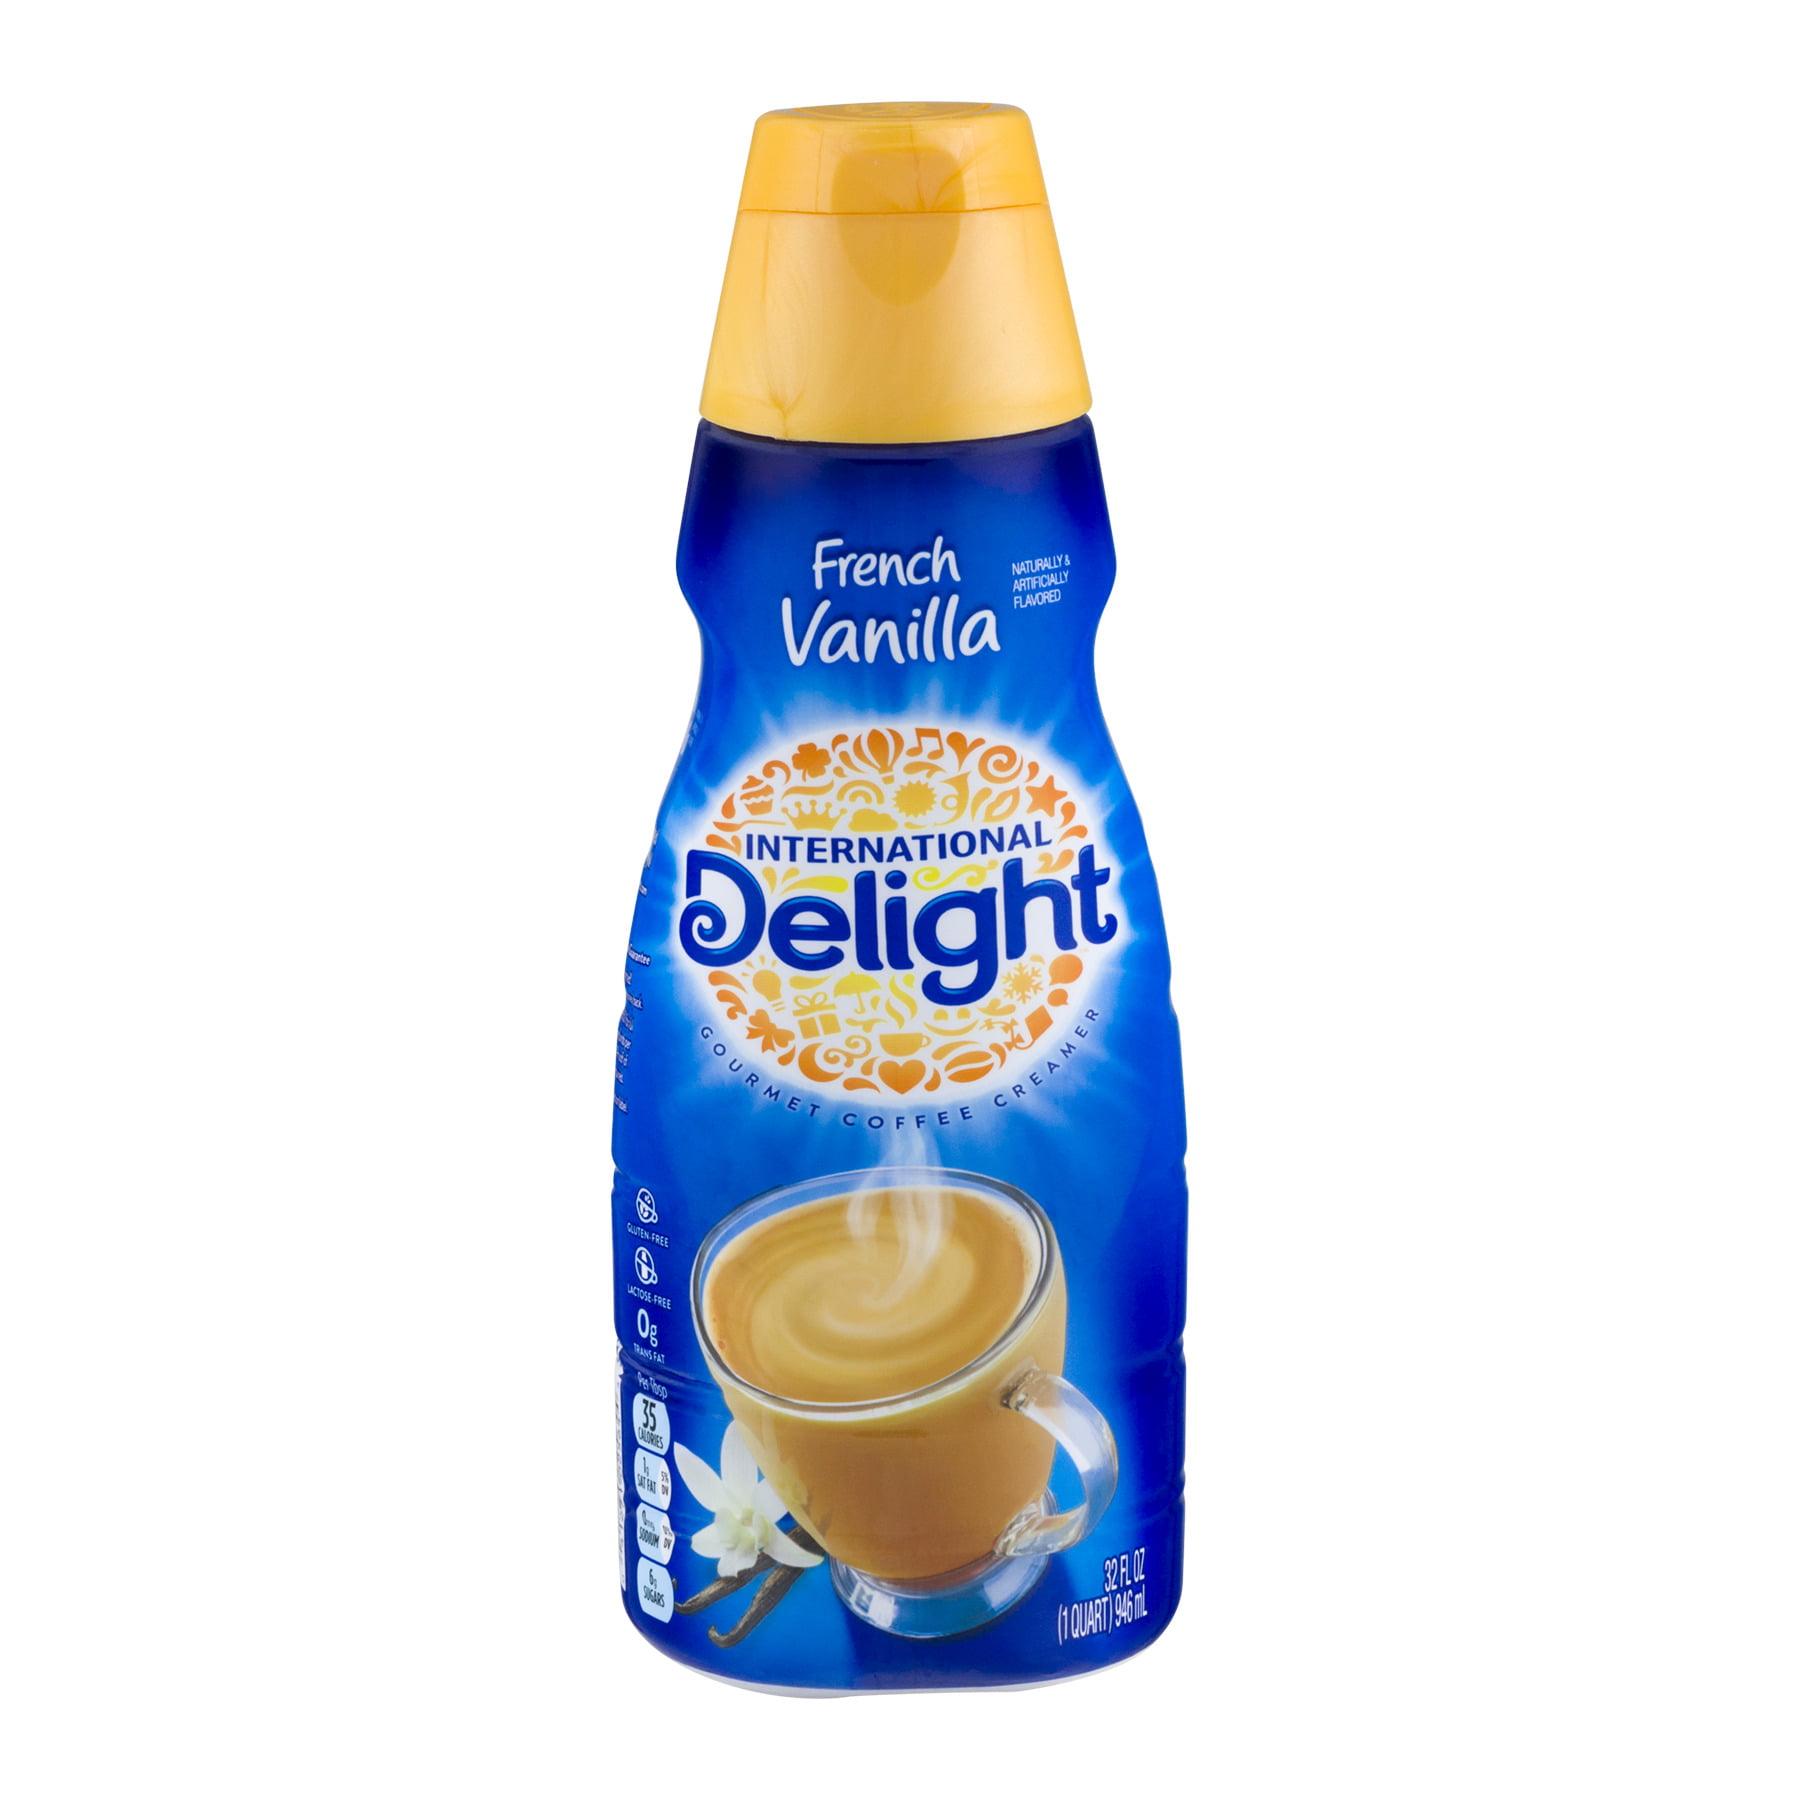 International Delight Sugar Free French Vanilla Gourmet Coffee Creamer, 1 Quart See Details Product - International Delight One Touch Latte Caramel Frothing Coffee Creamer, 12 Oz.